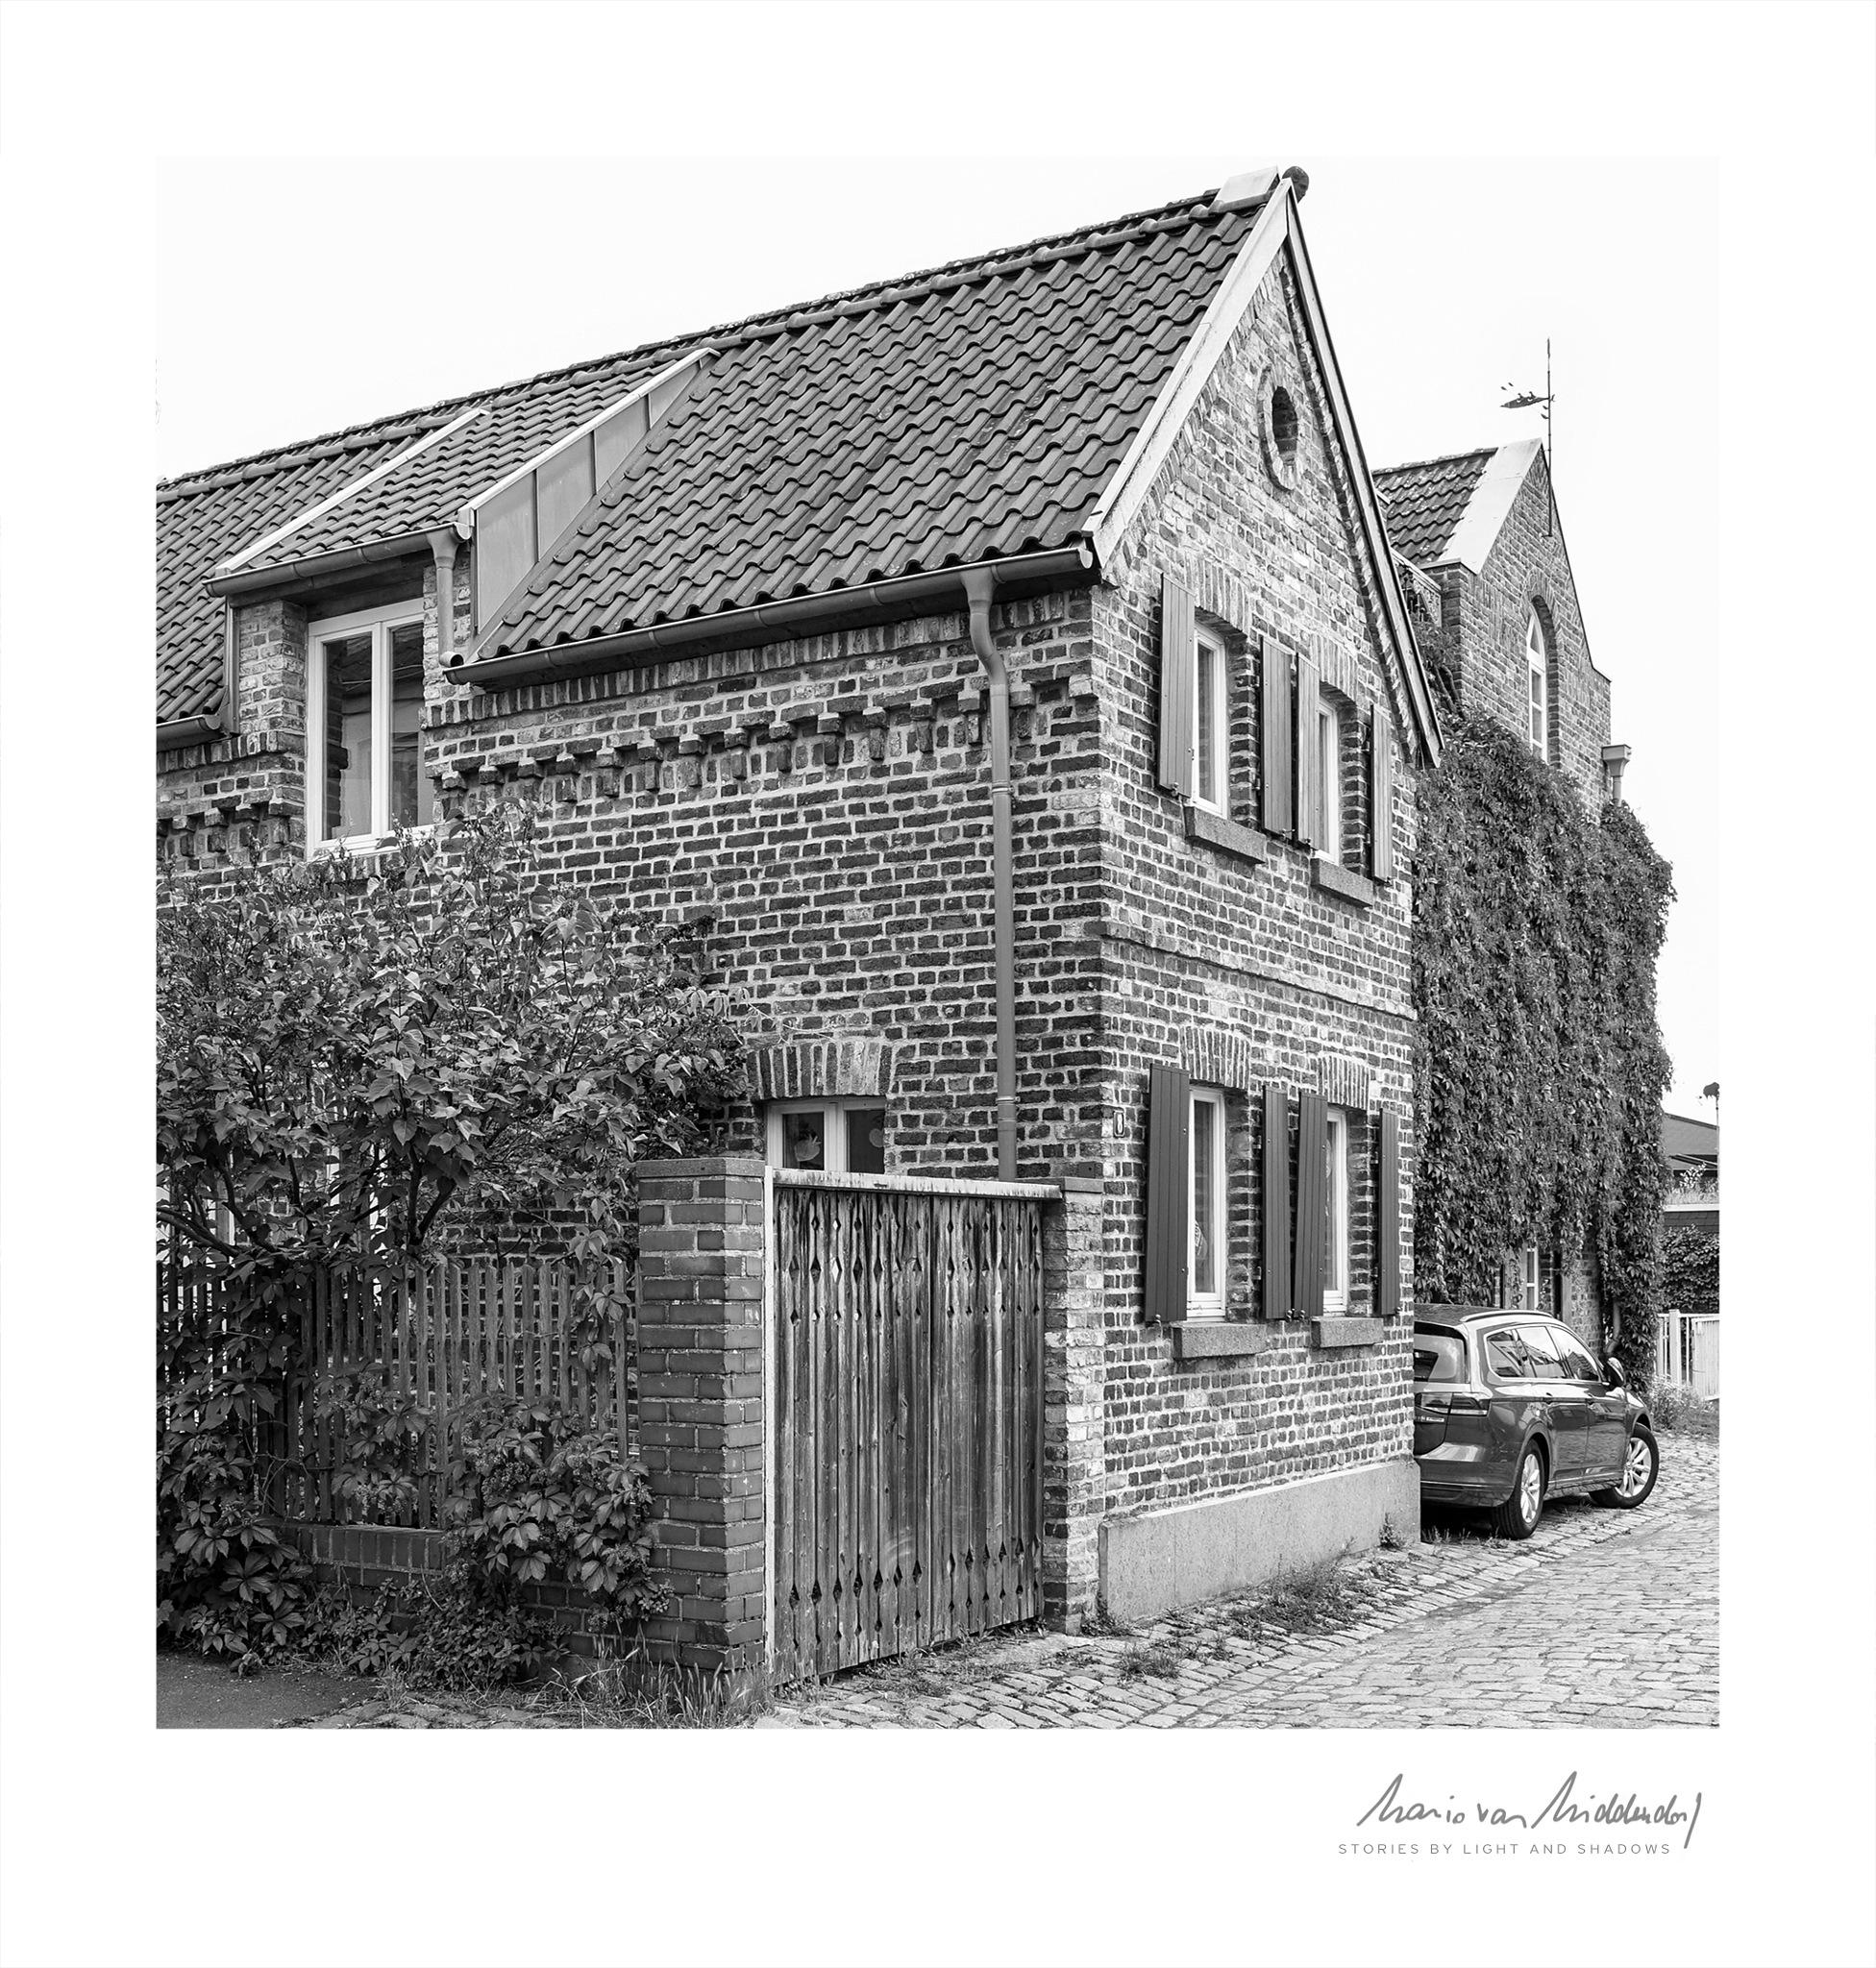 Little Rhine House by Mario van Middendorf